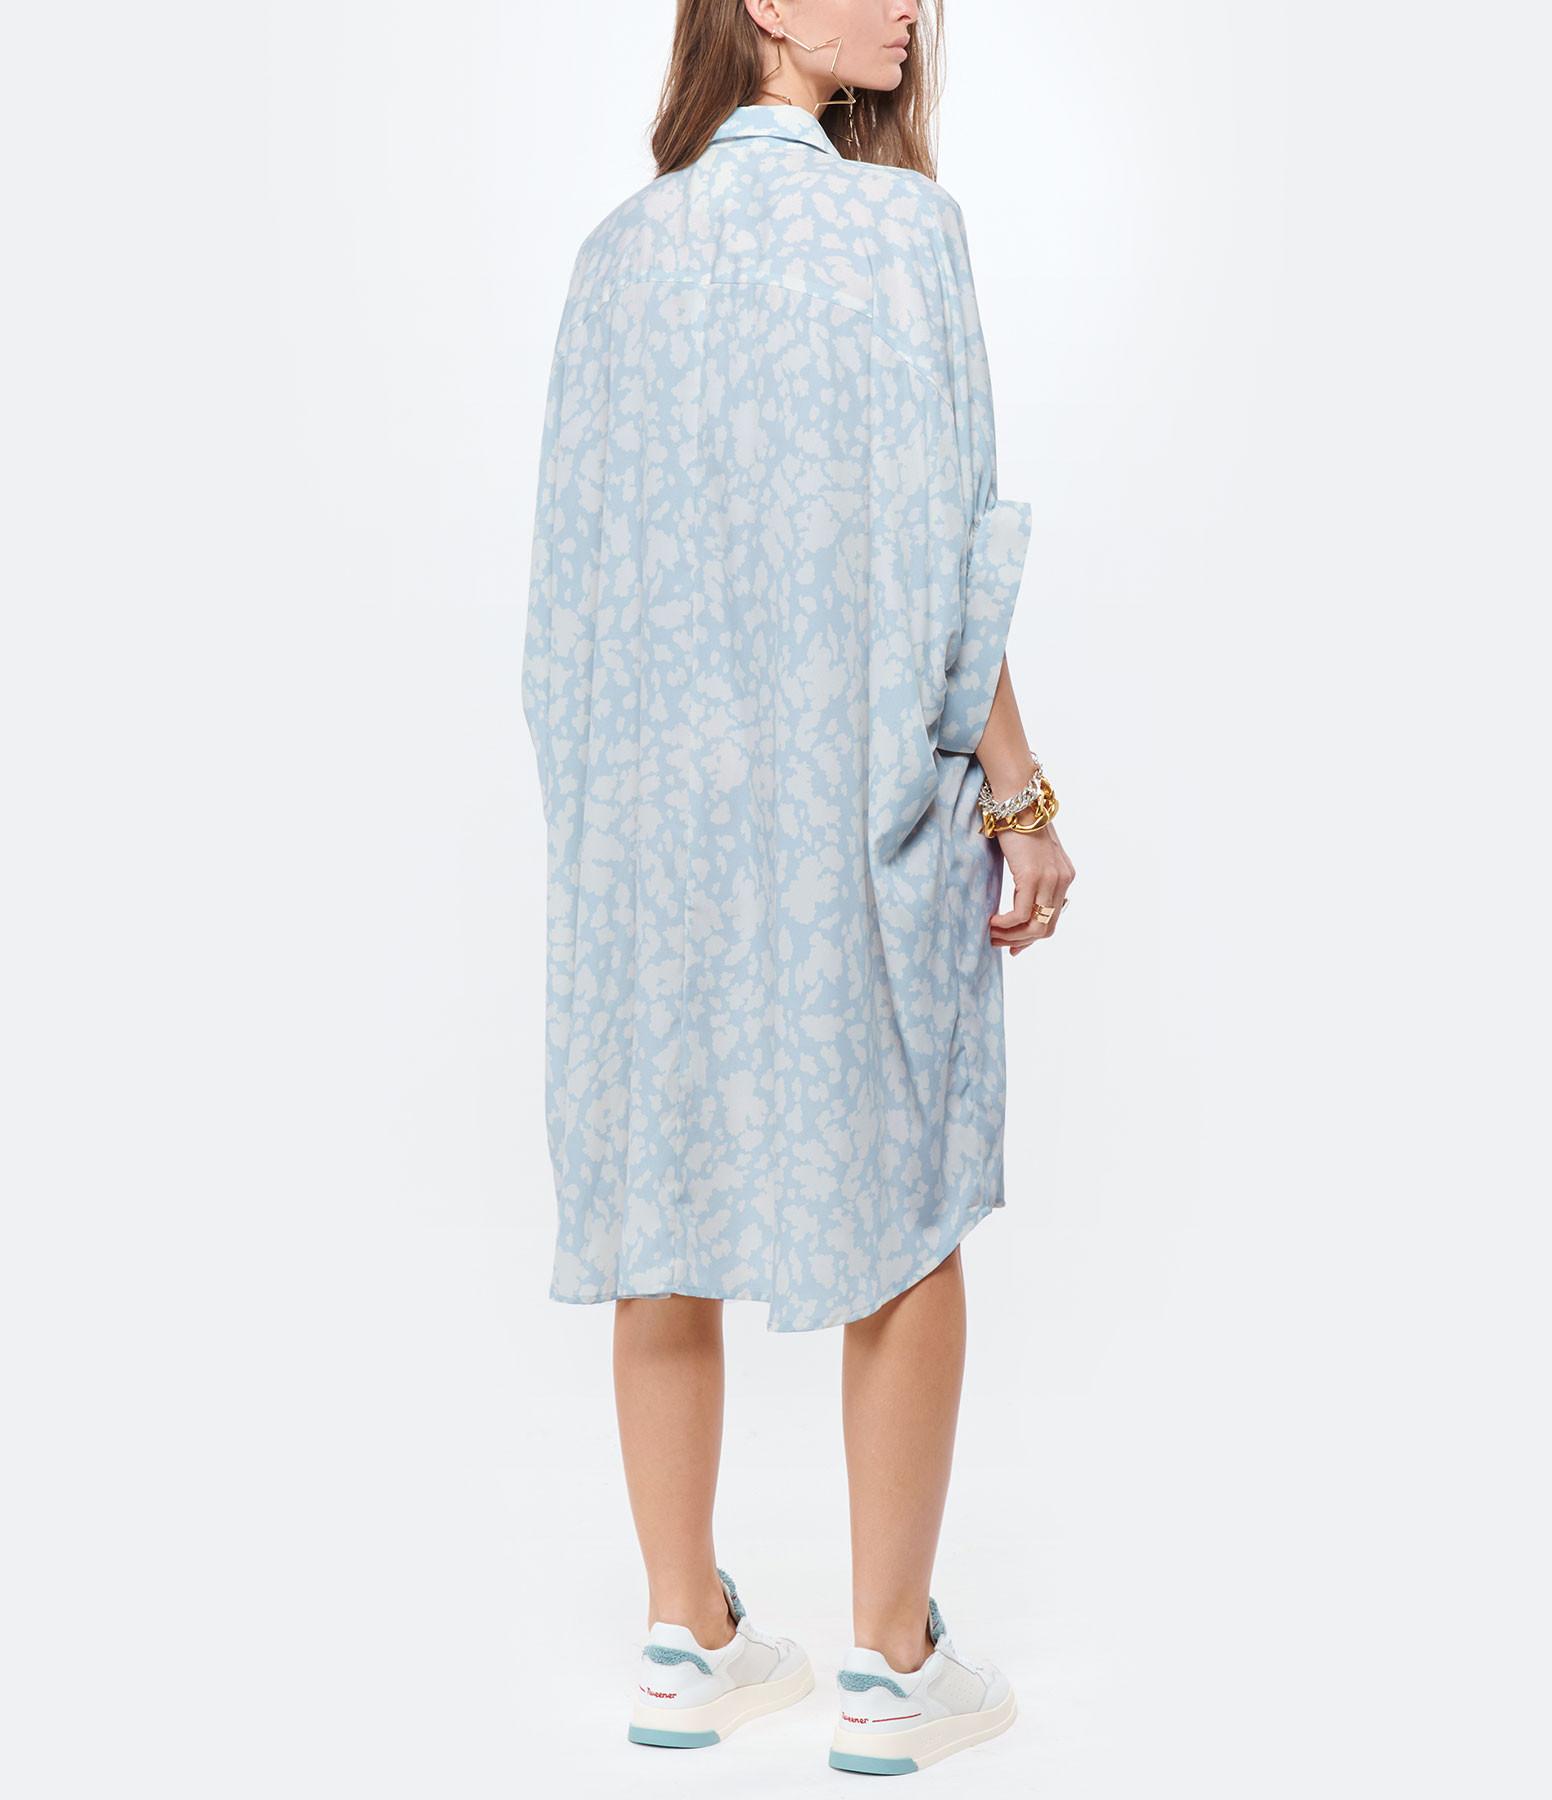 MAISON HAUSSMANN - Robe Crêpe Cloudy Imprimé